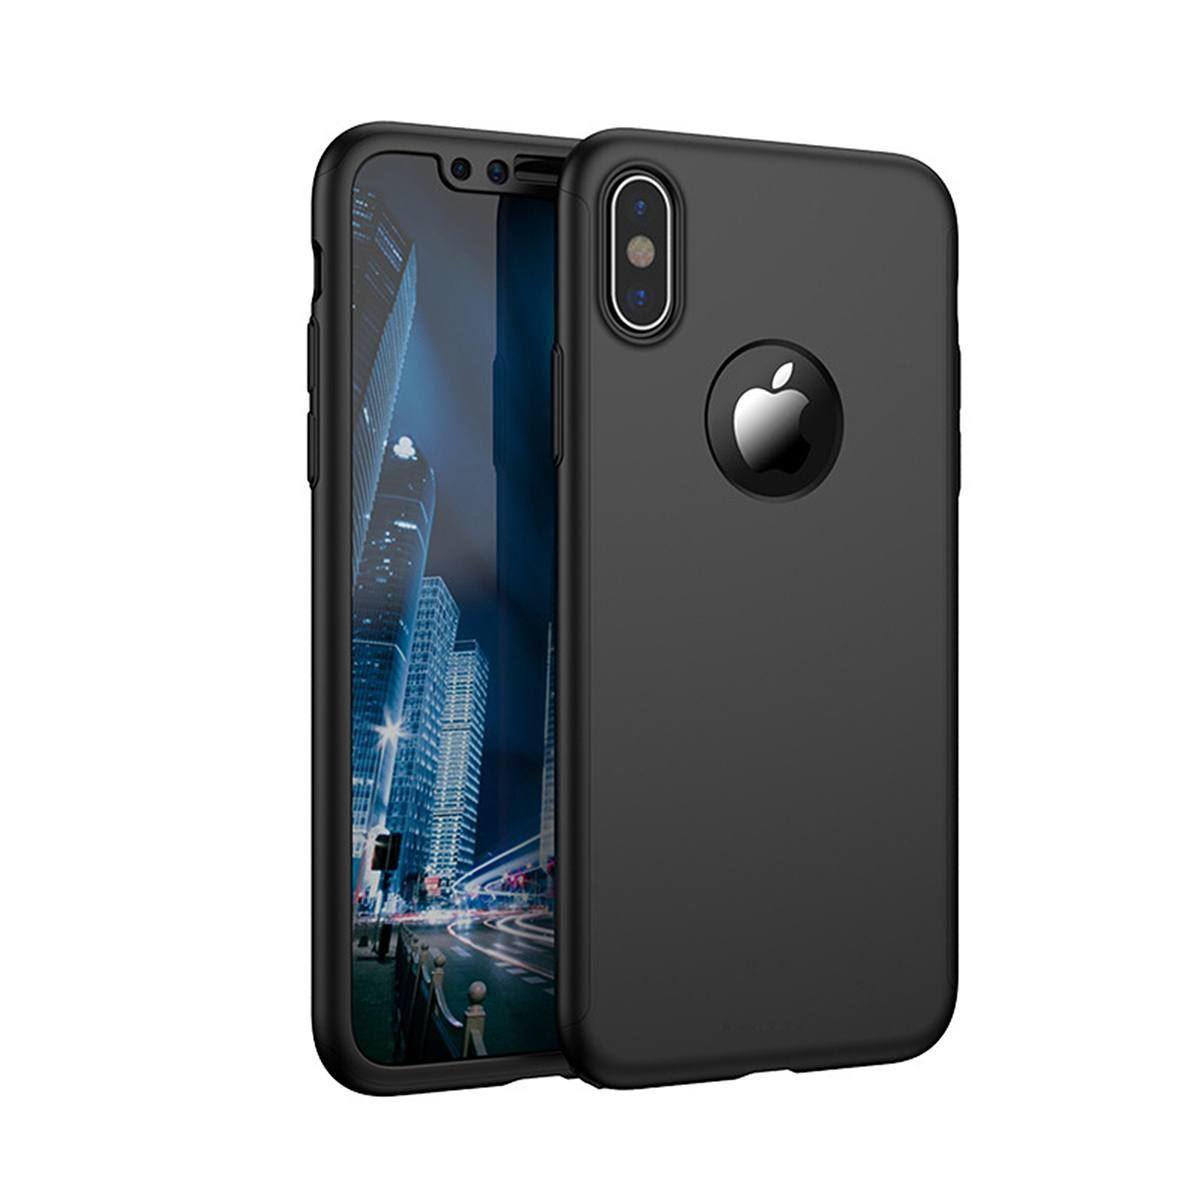 For-Apple-iPhone-XS-Max-XR-Hybrid-360-Slim-Ultra-Thin-Heavy-Duty-Shockproof-Case Indexbild 21